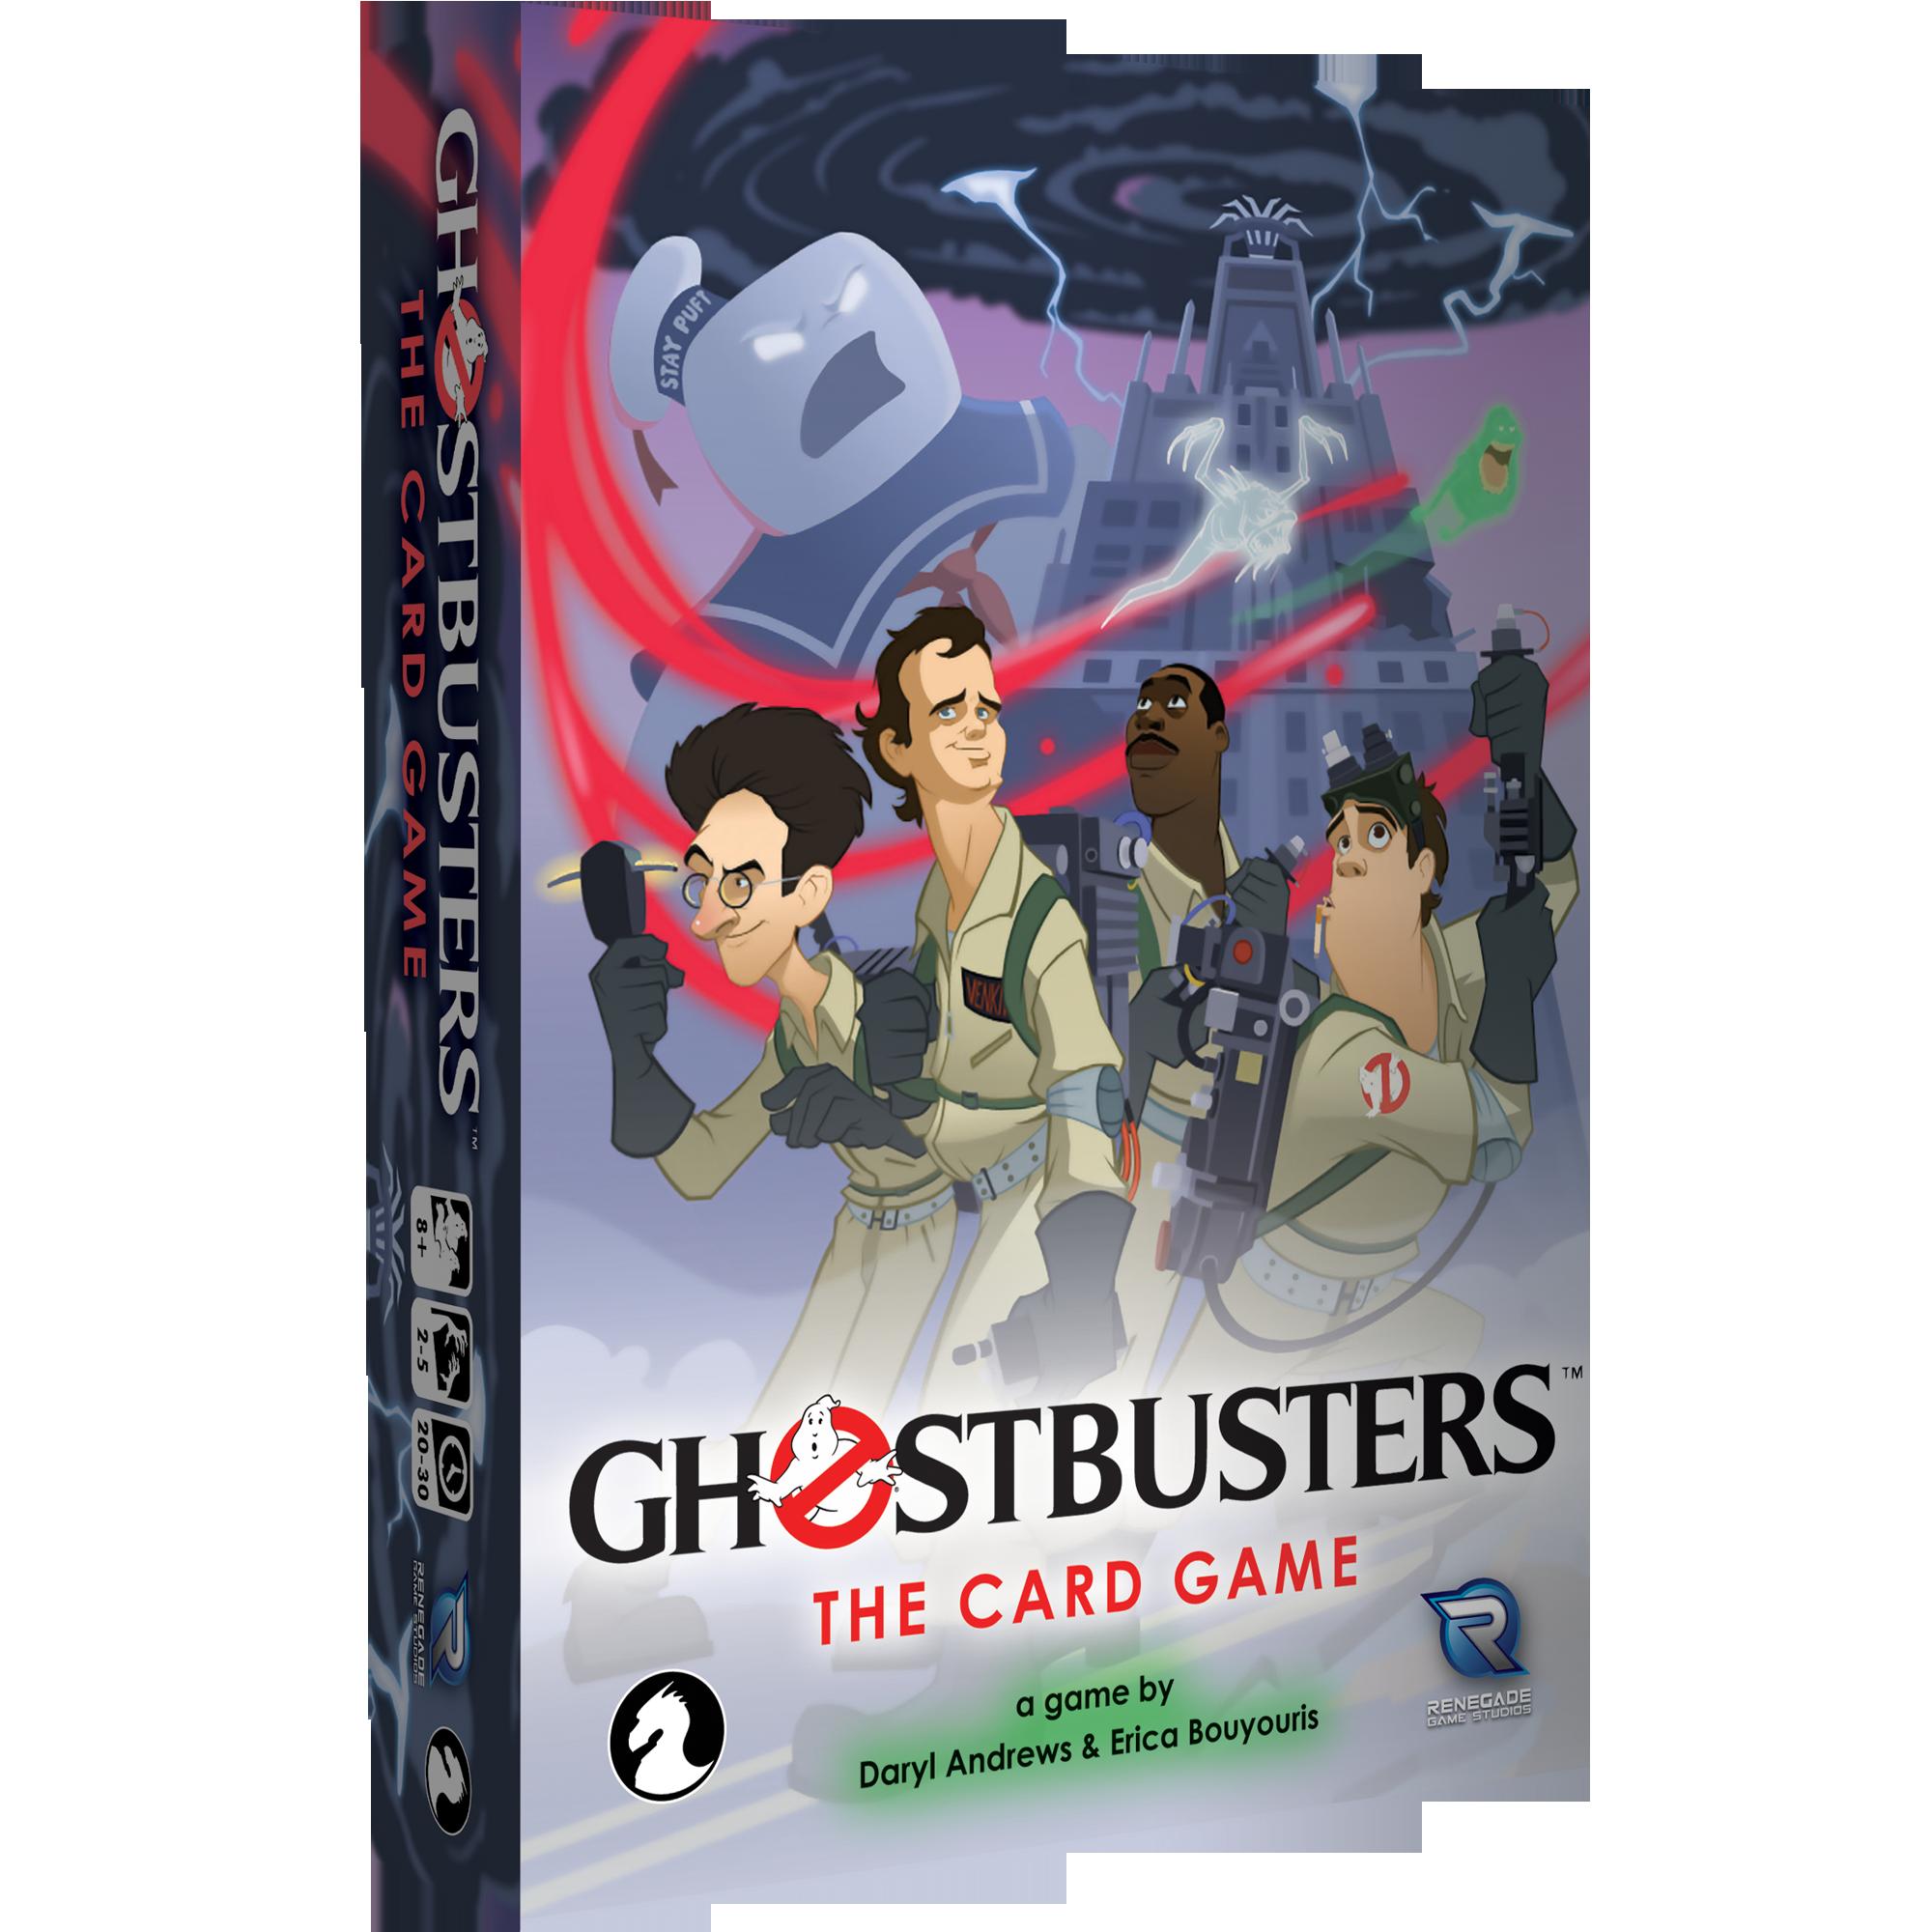 Ghostbusters_Retail-Box_RGB.png